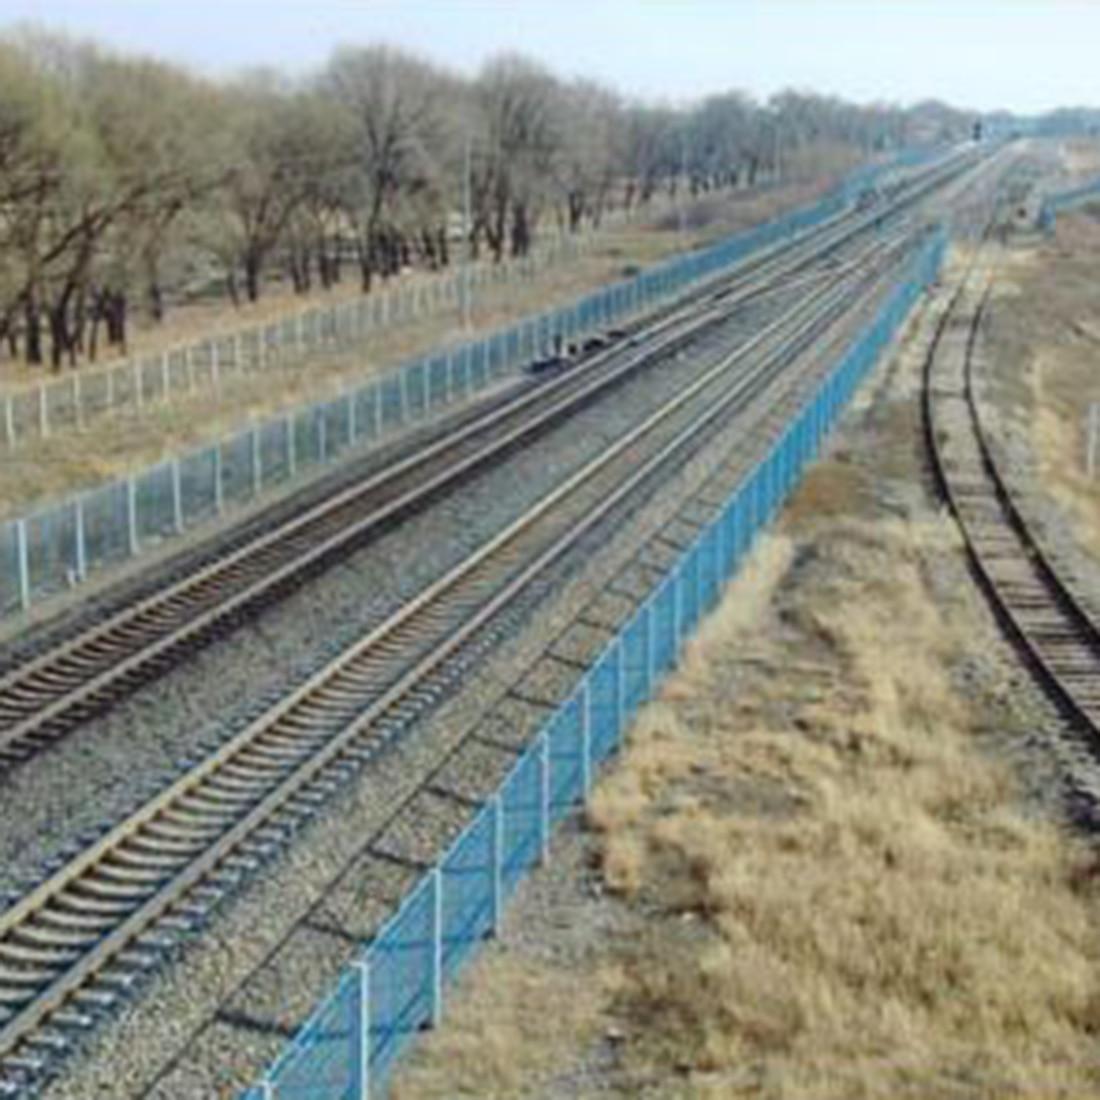 1:87 HO Scale Train Model Construction Scene Sand Table Railway Fence